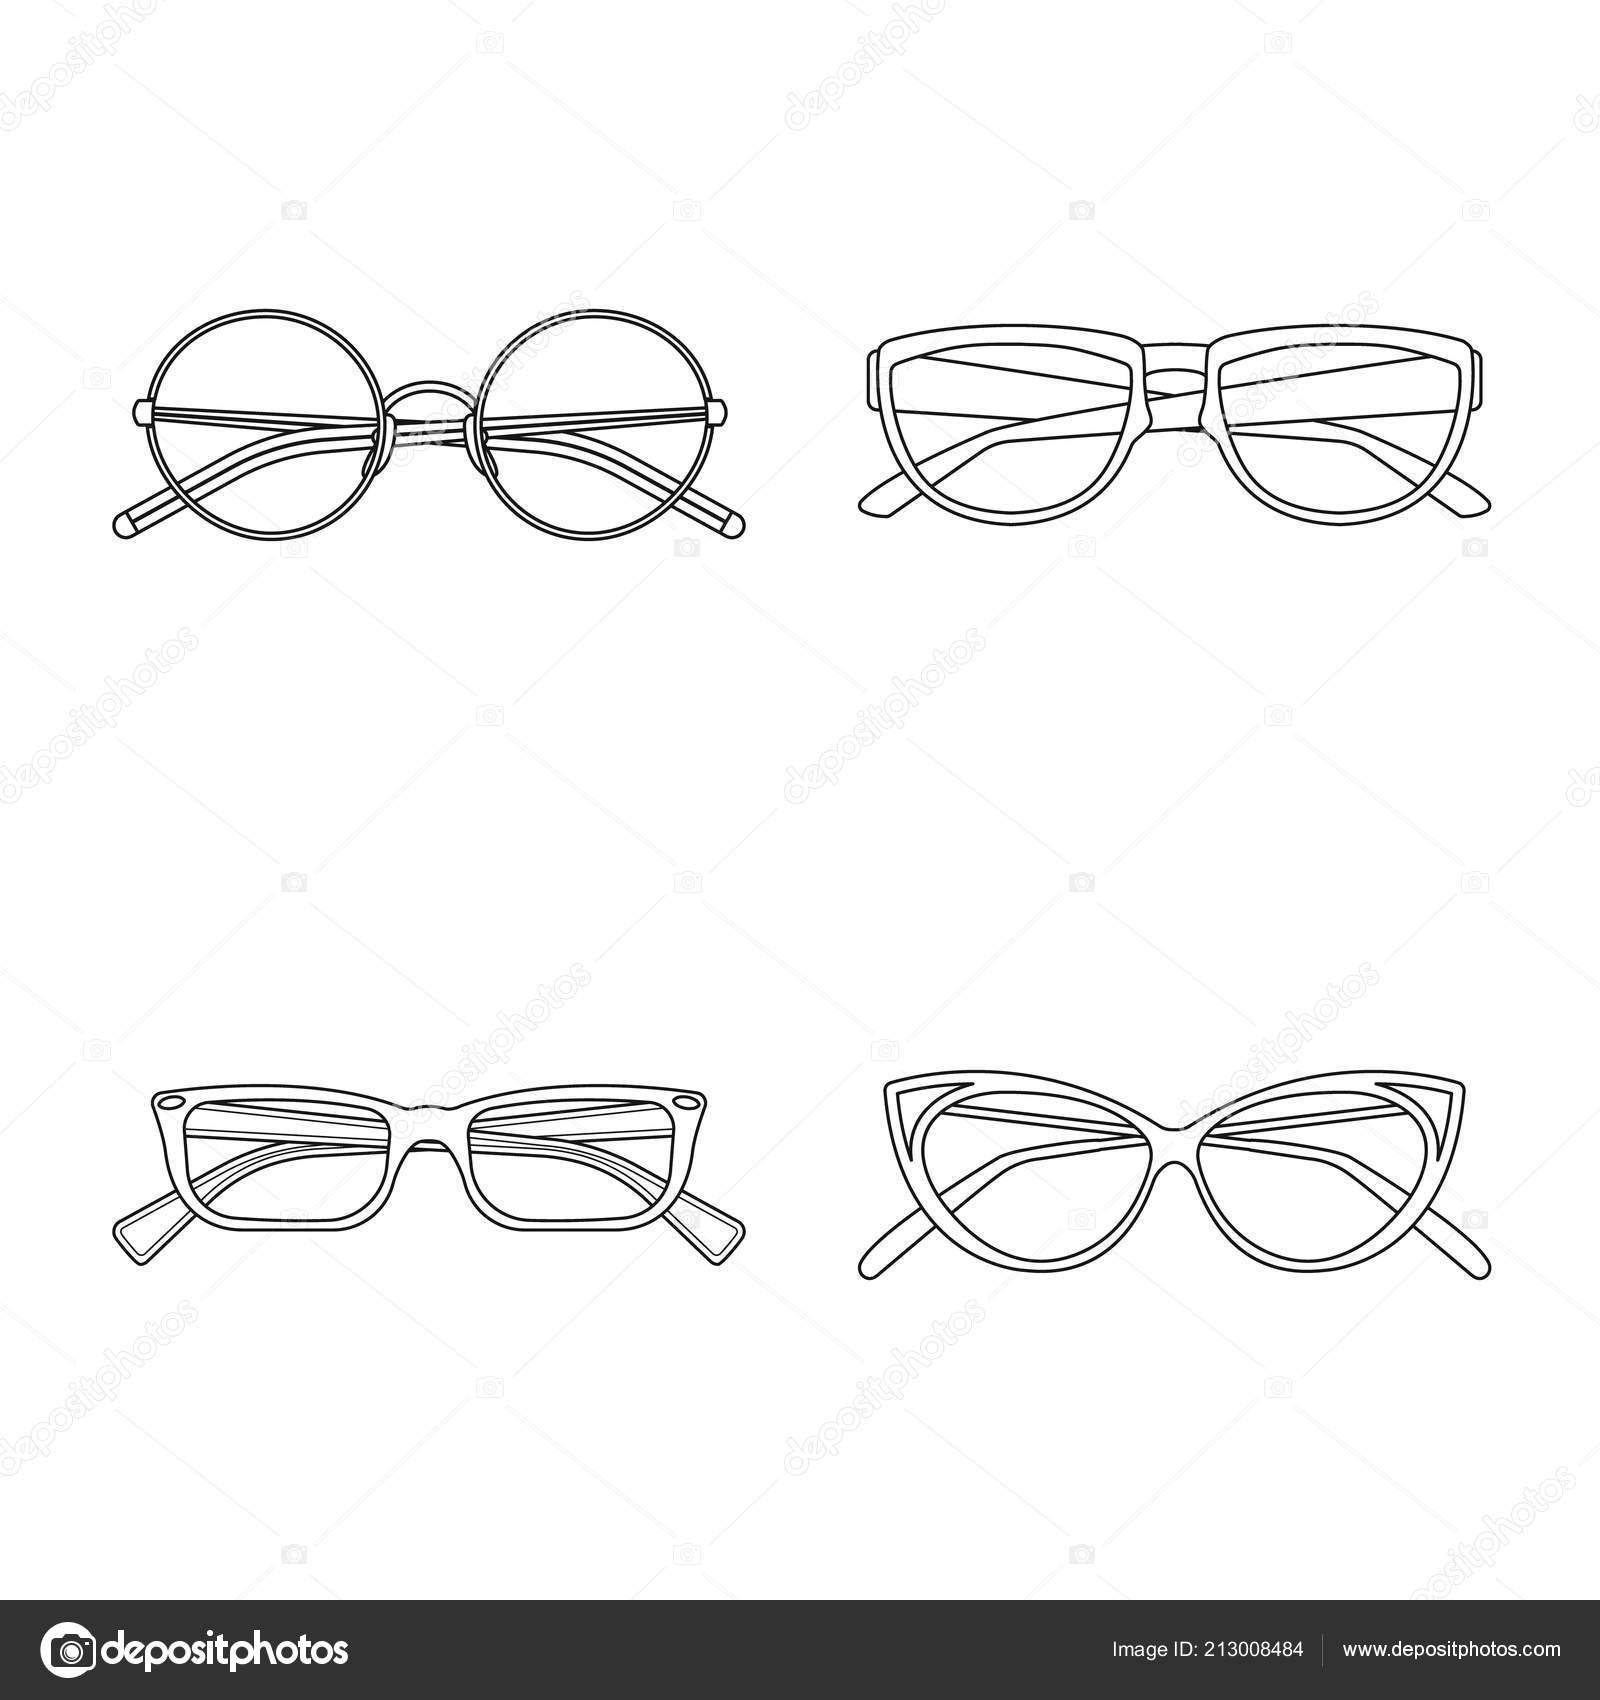 Vector Illustration Of Glasses And Frame Symbol Set Of Glasses And